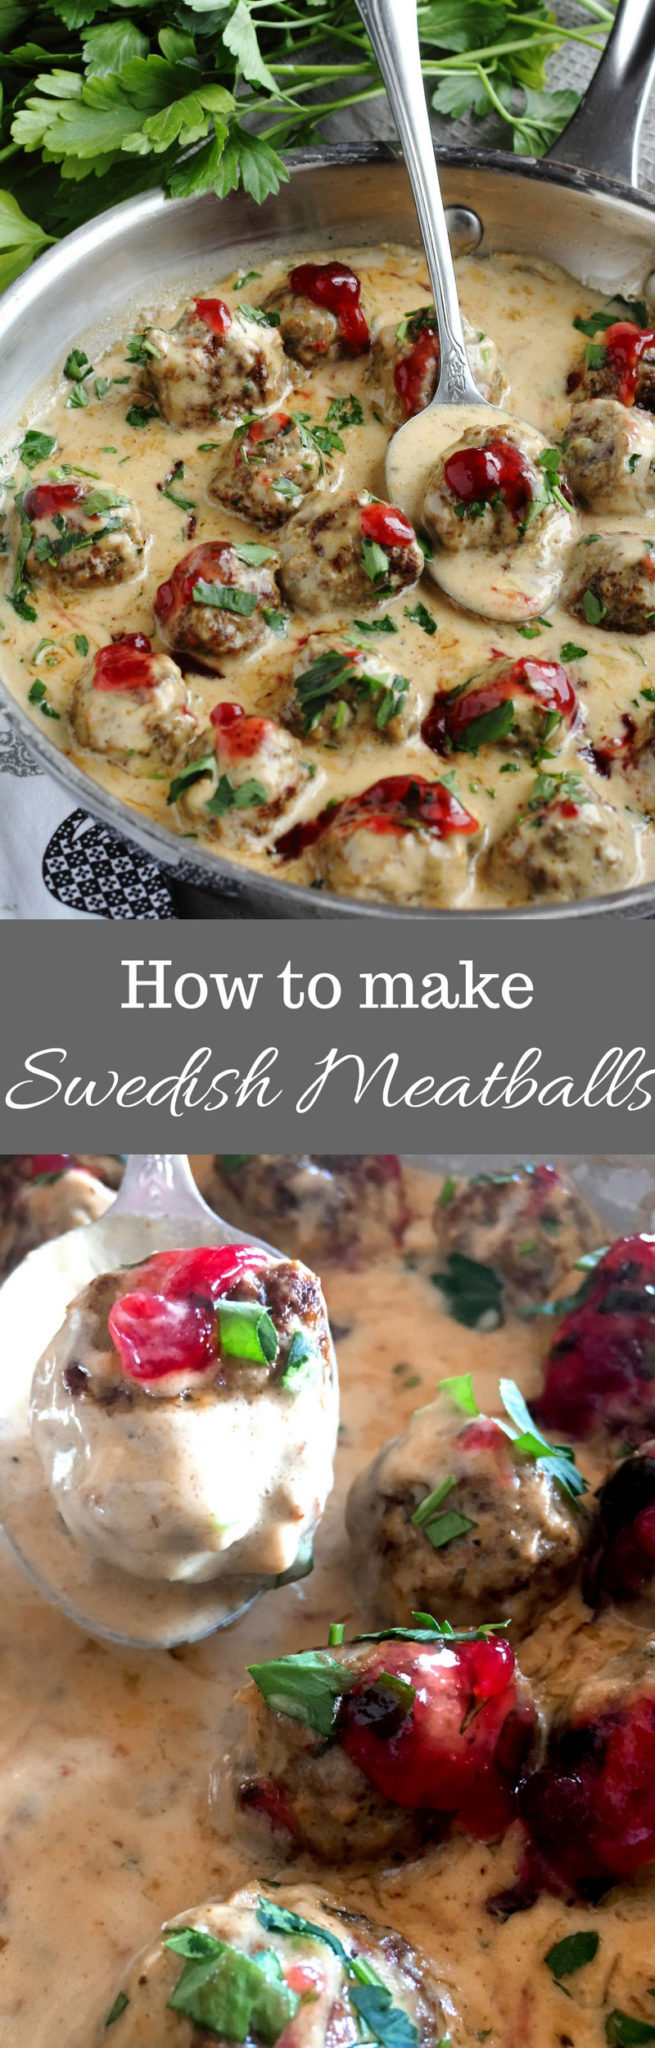 Swedish Meatballs Lunch Dinner Ground Beef Tarragon Onion Allspice Garlic Parsley Gravy